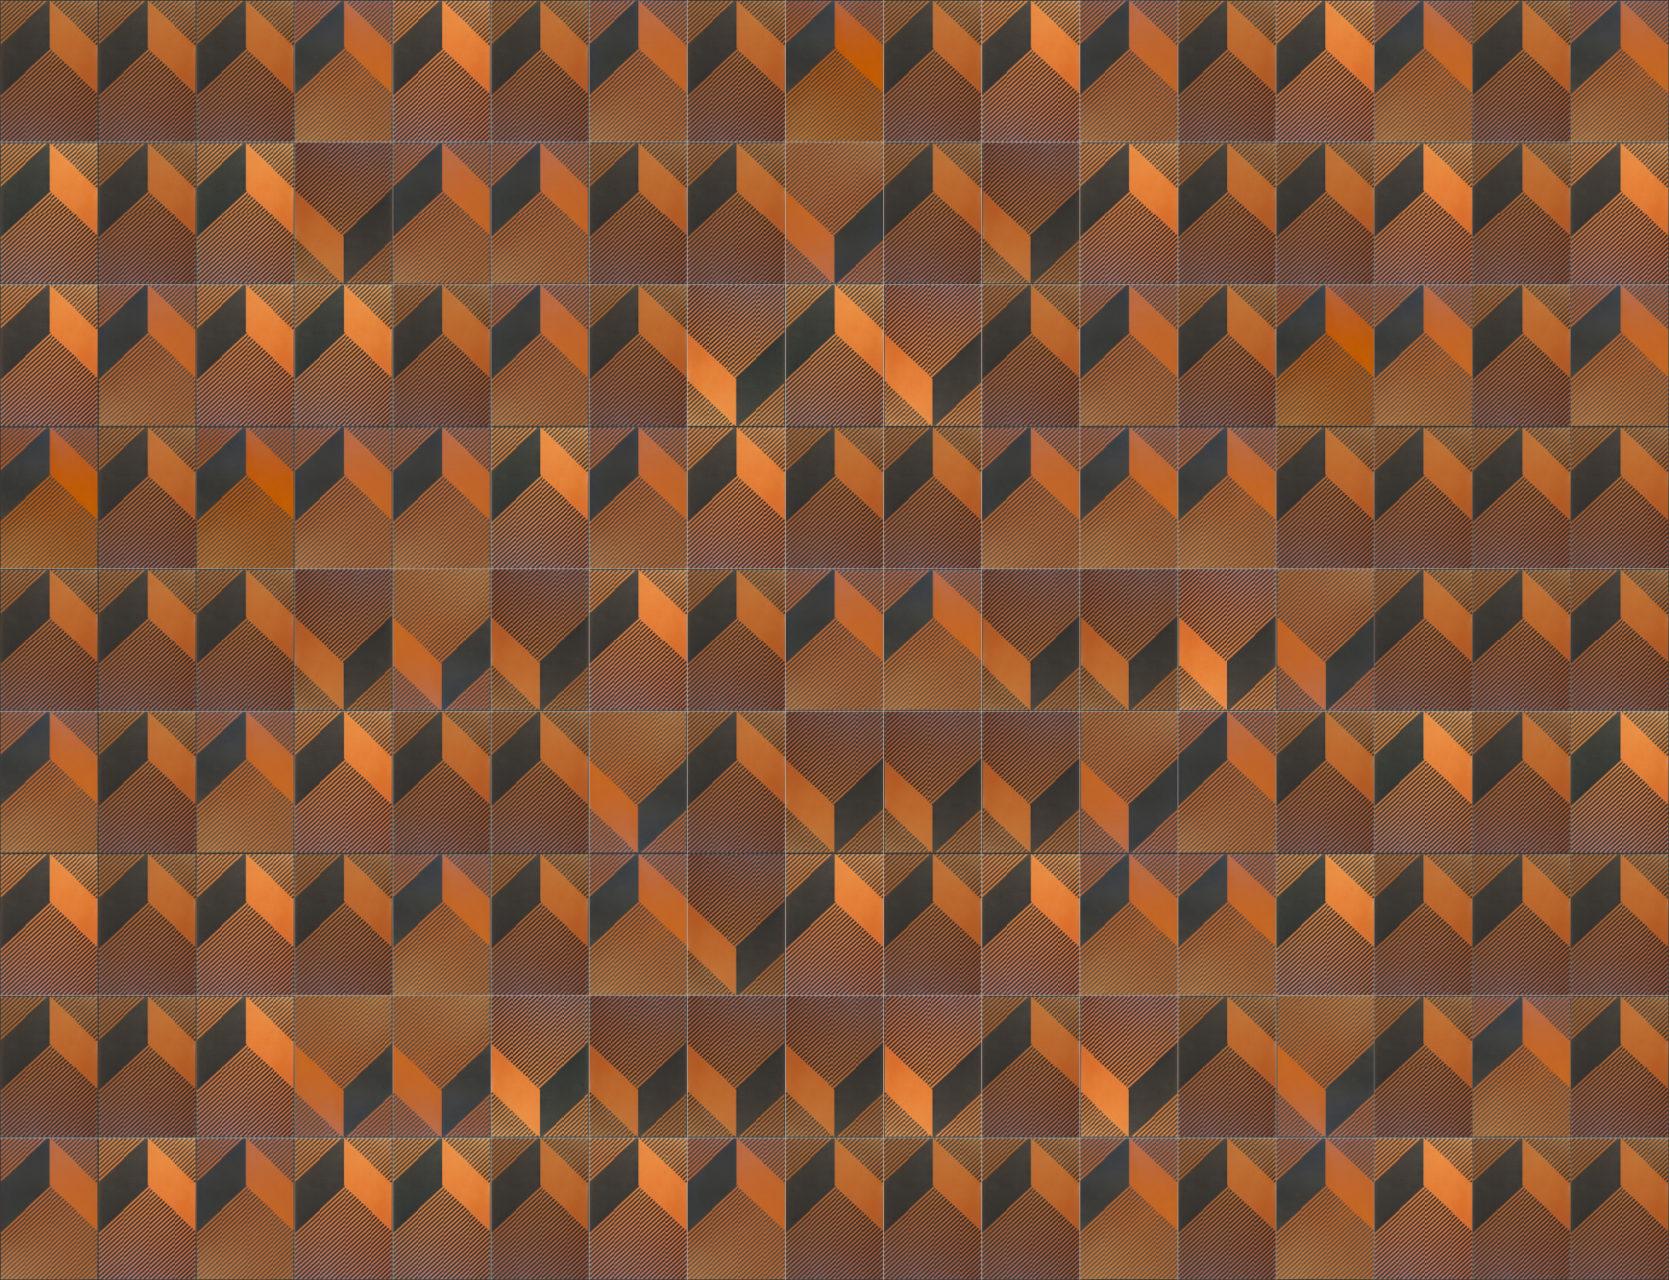 geometrico_rouge_mur02